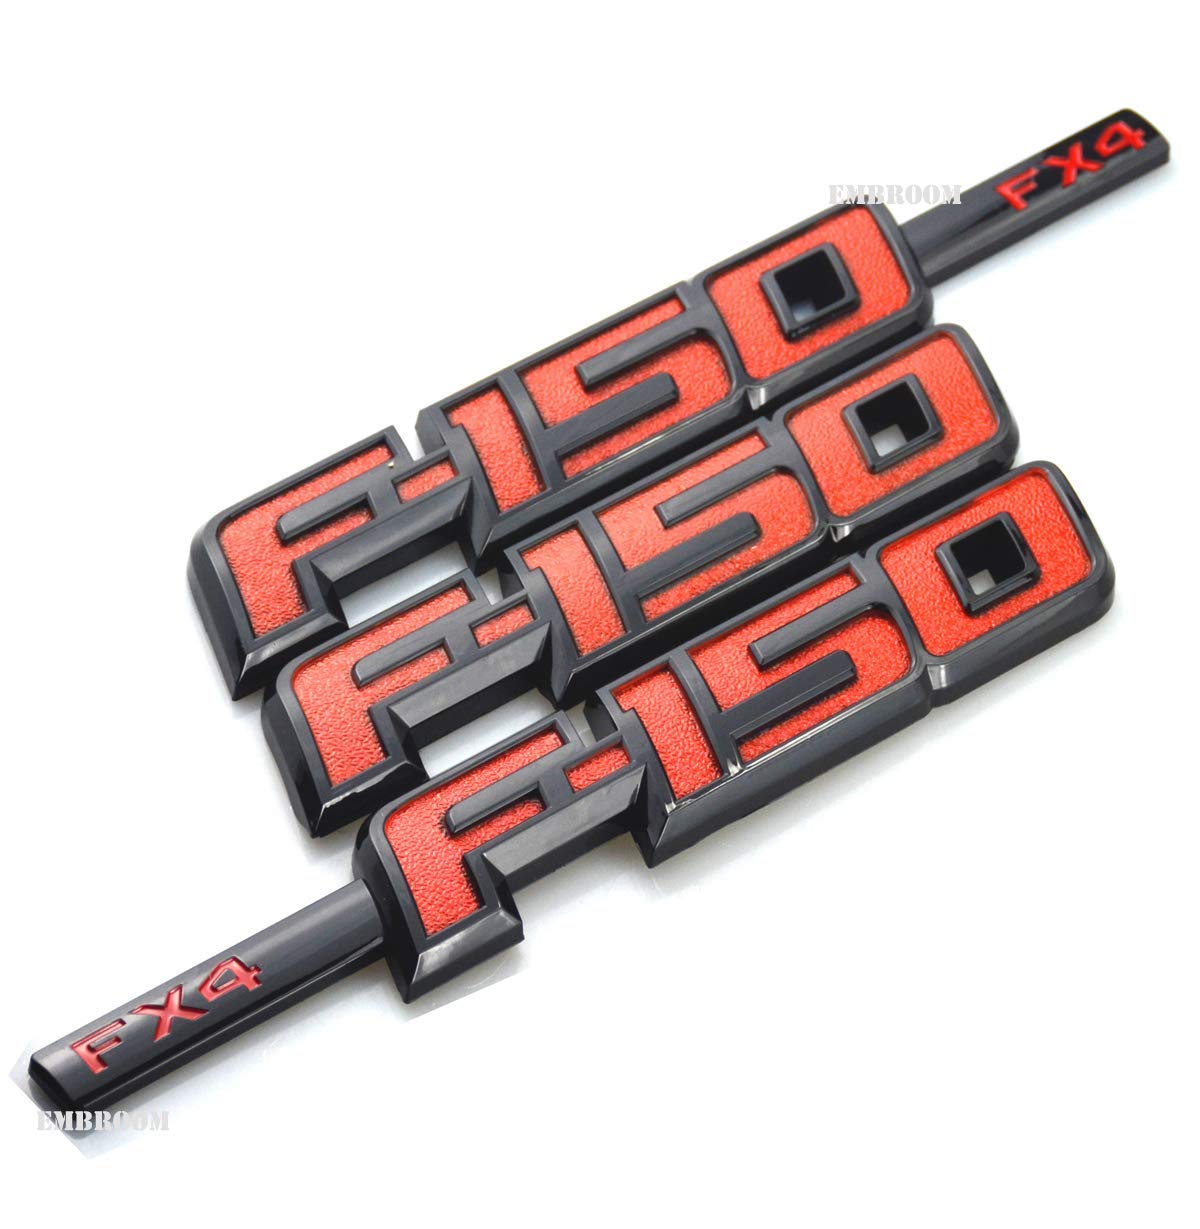 Black 3pcs OEM F-150 Fx4 Emblem Fender F-150 Rear Tailgate Badge 3D Nameplate Replacement for F150 Origianl Size Genuine Parts Black Red